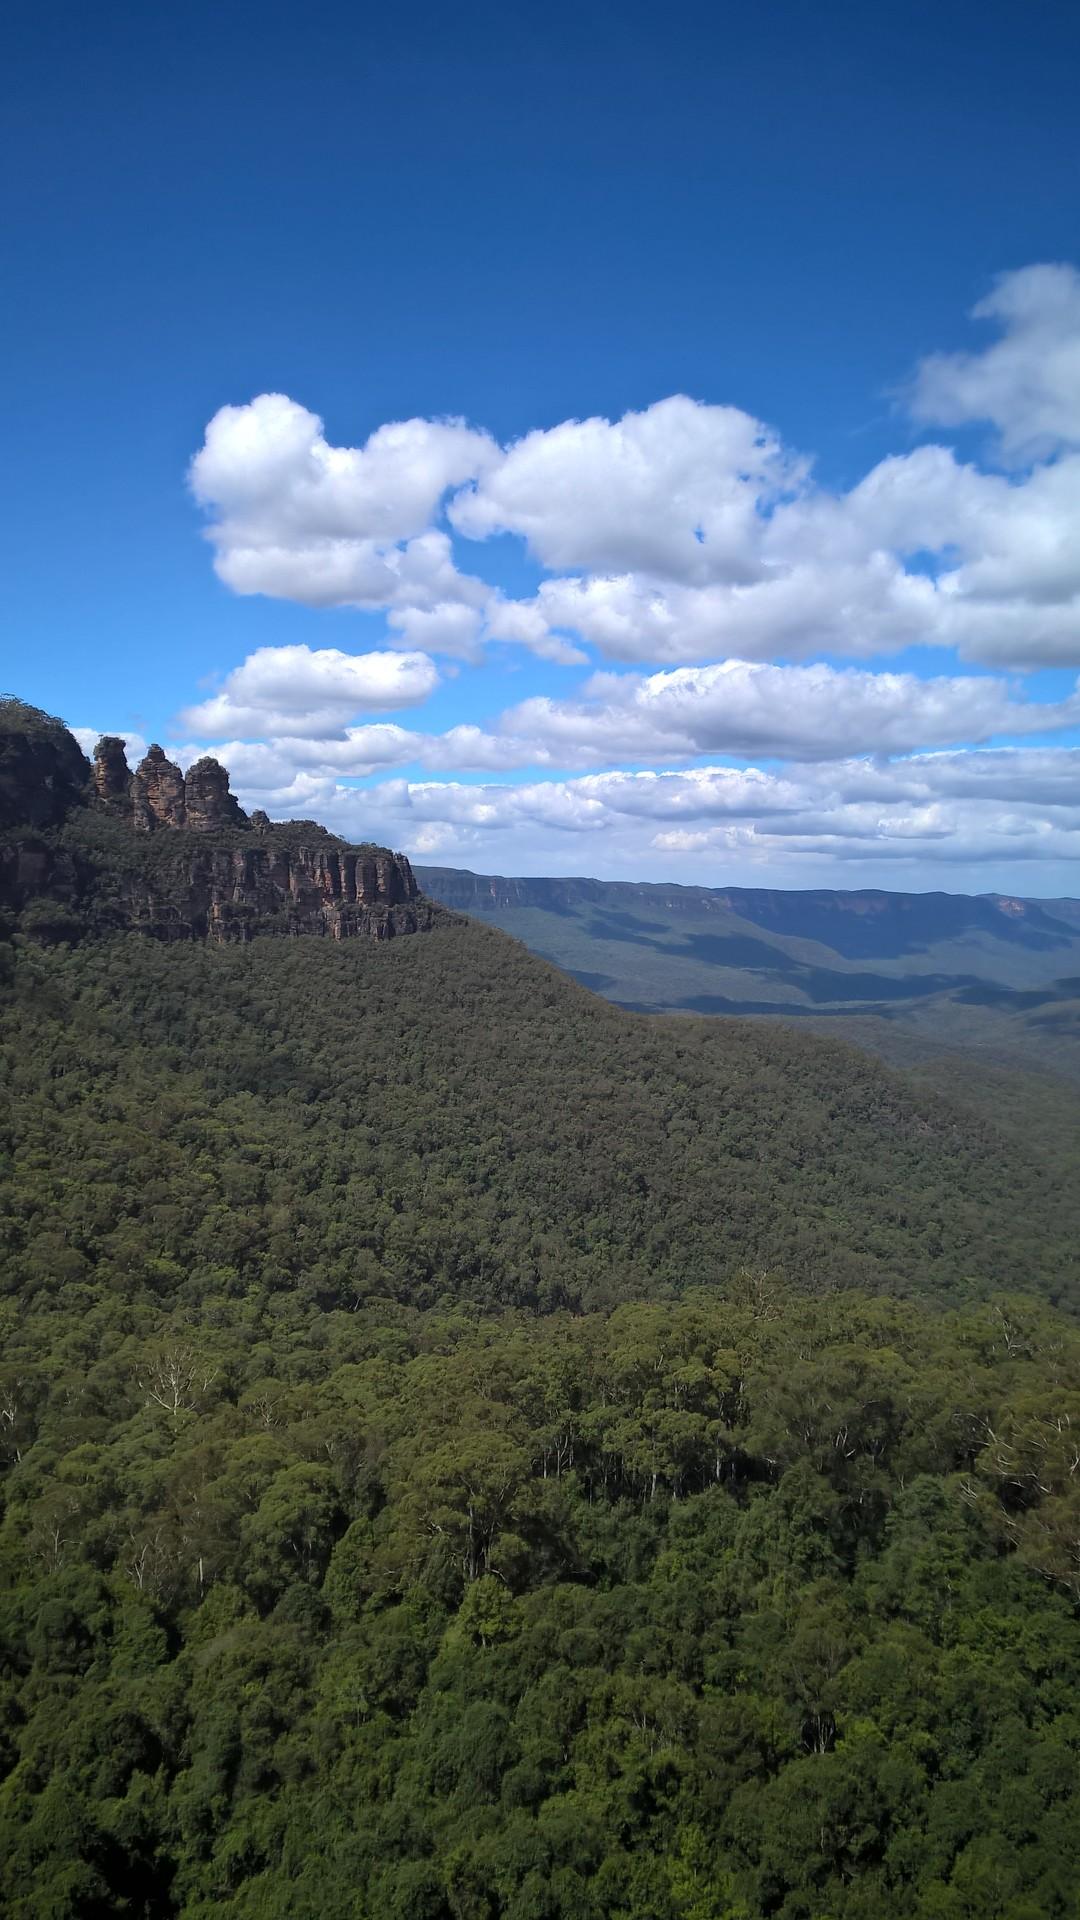 Парк Блю Маунтинс, Голубые горы, Австралия